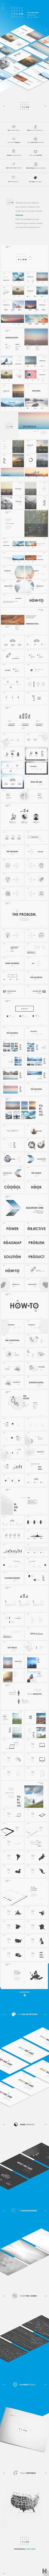 Flow Keynote — Keynote KEY #creative #presentation • Available here → https://graphicriver.net/item/flow-keynote/19330877?ref=pxcr